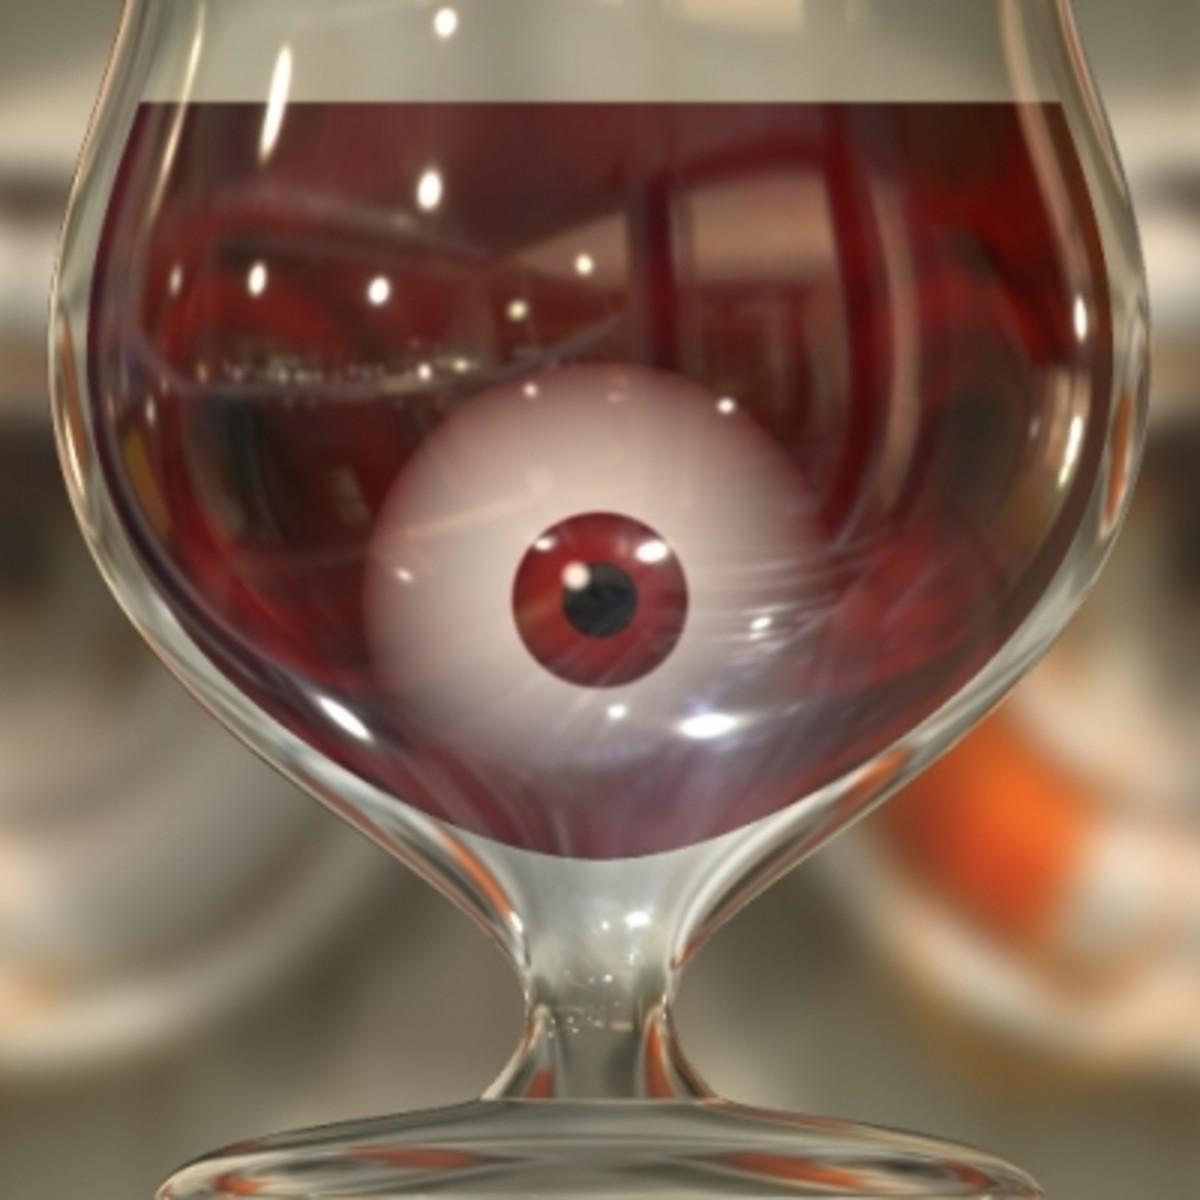 Add eyeballs to your Halloween drink